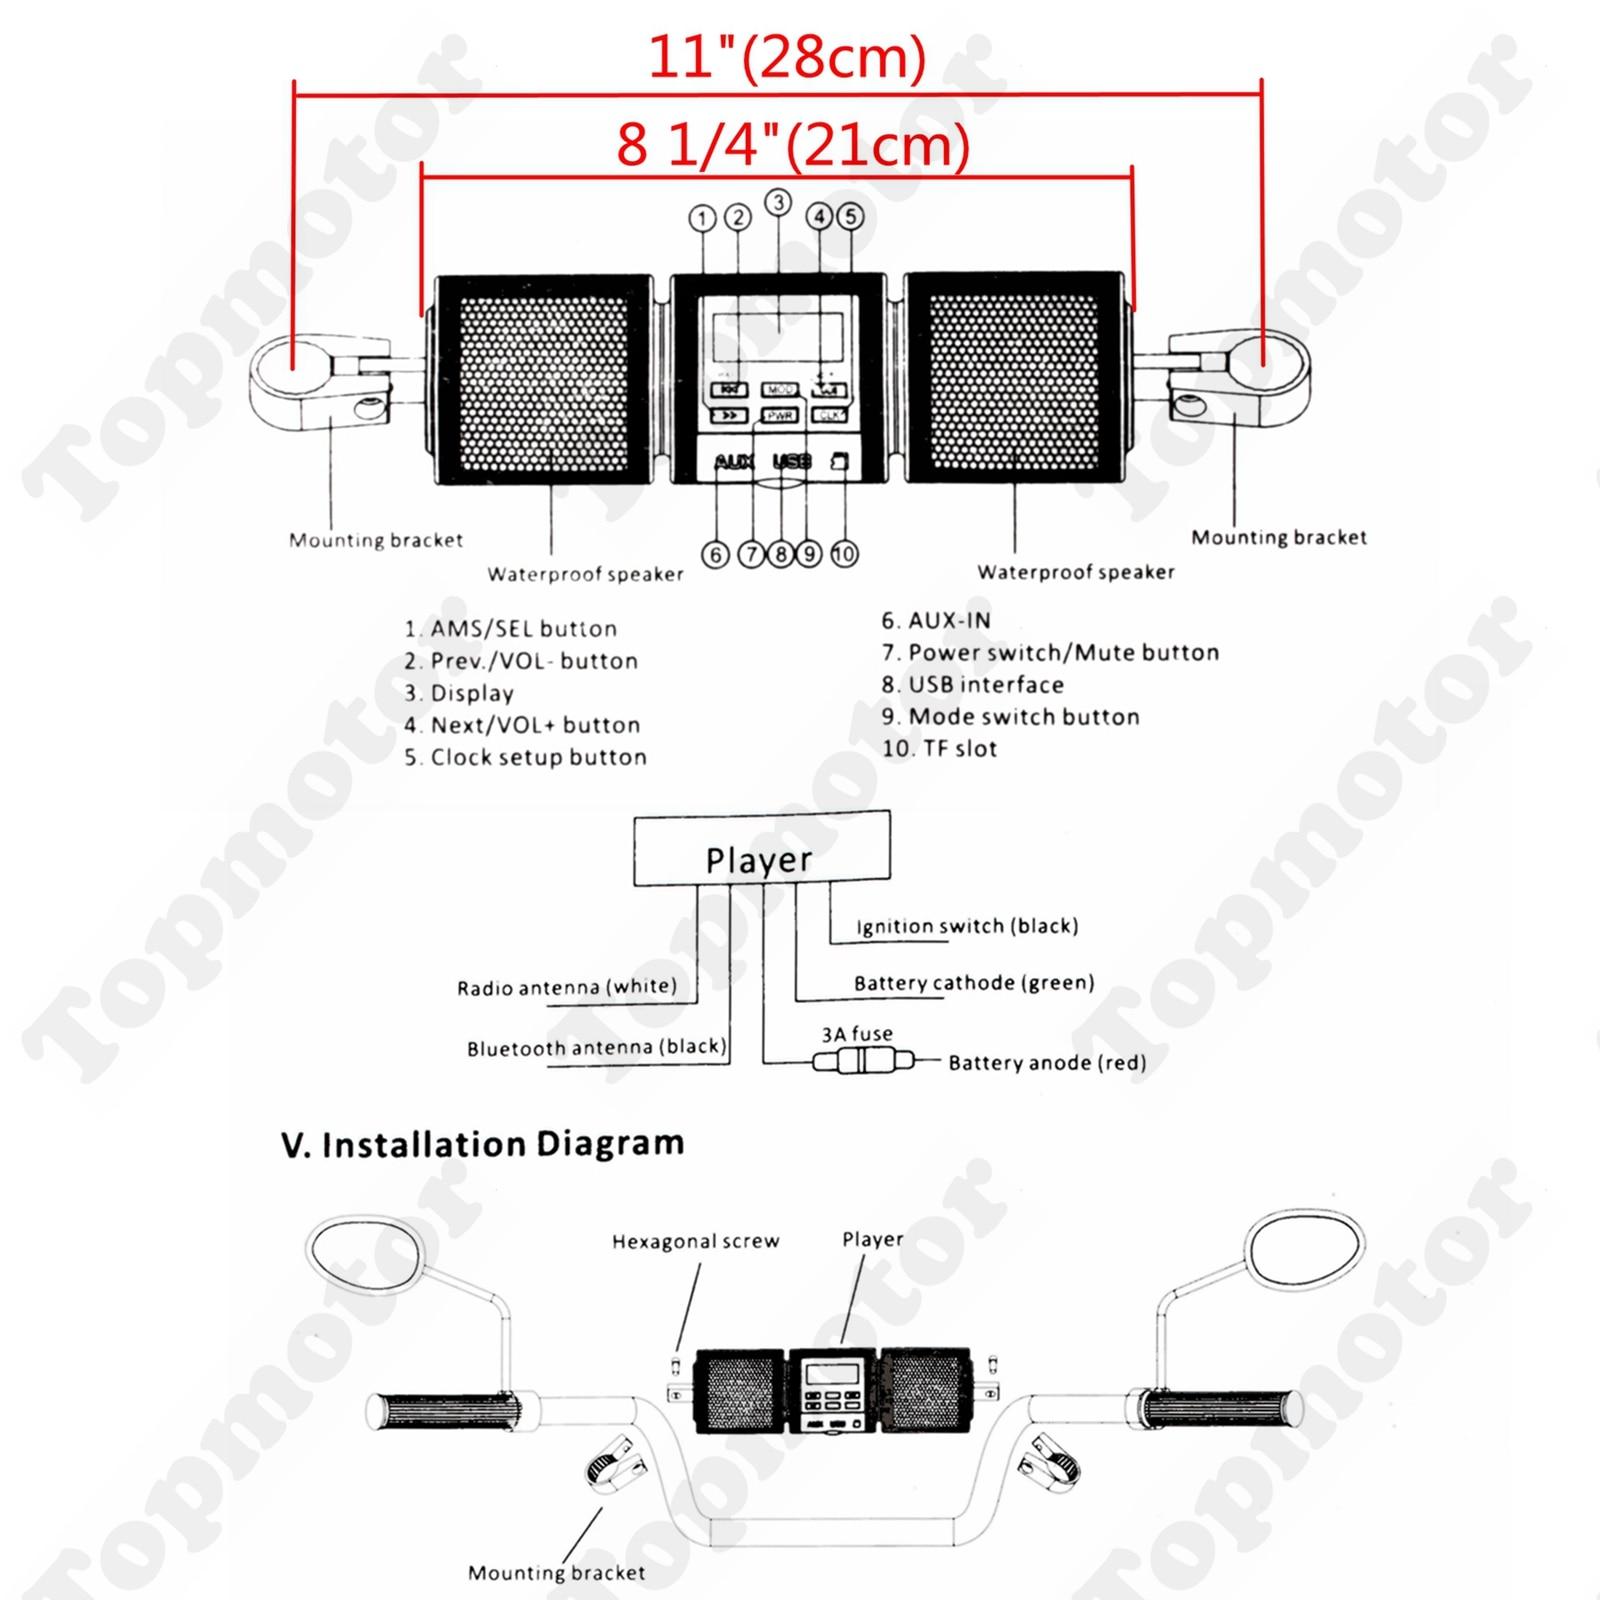 6 9 Sel Wiring Diagram Troubleshooting Diagrams Lighting 300 Control Rear Chrysler 2006modual Motor Transformer Internet Of Things